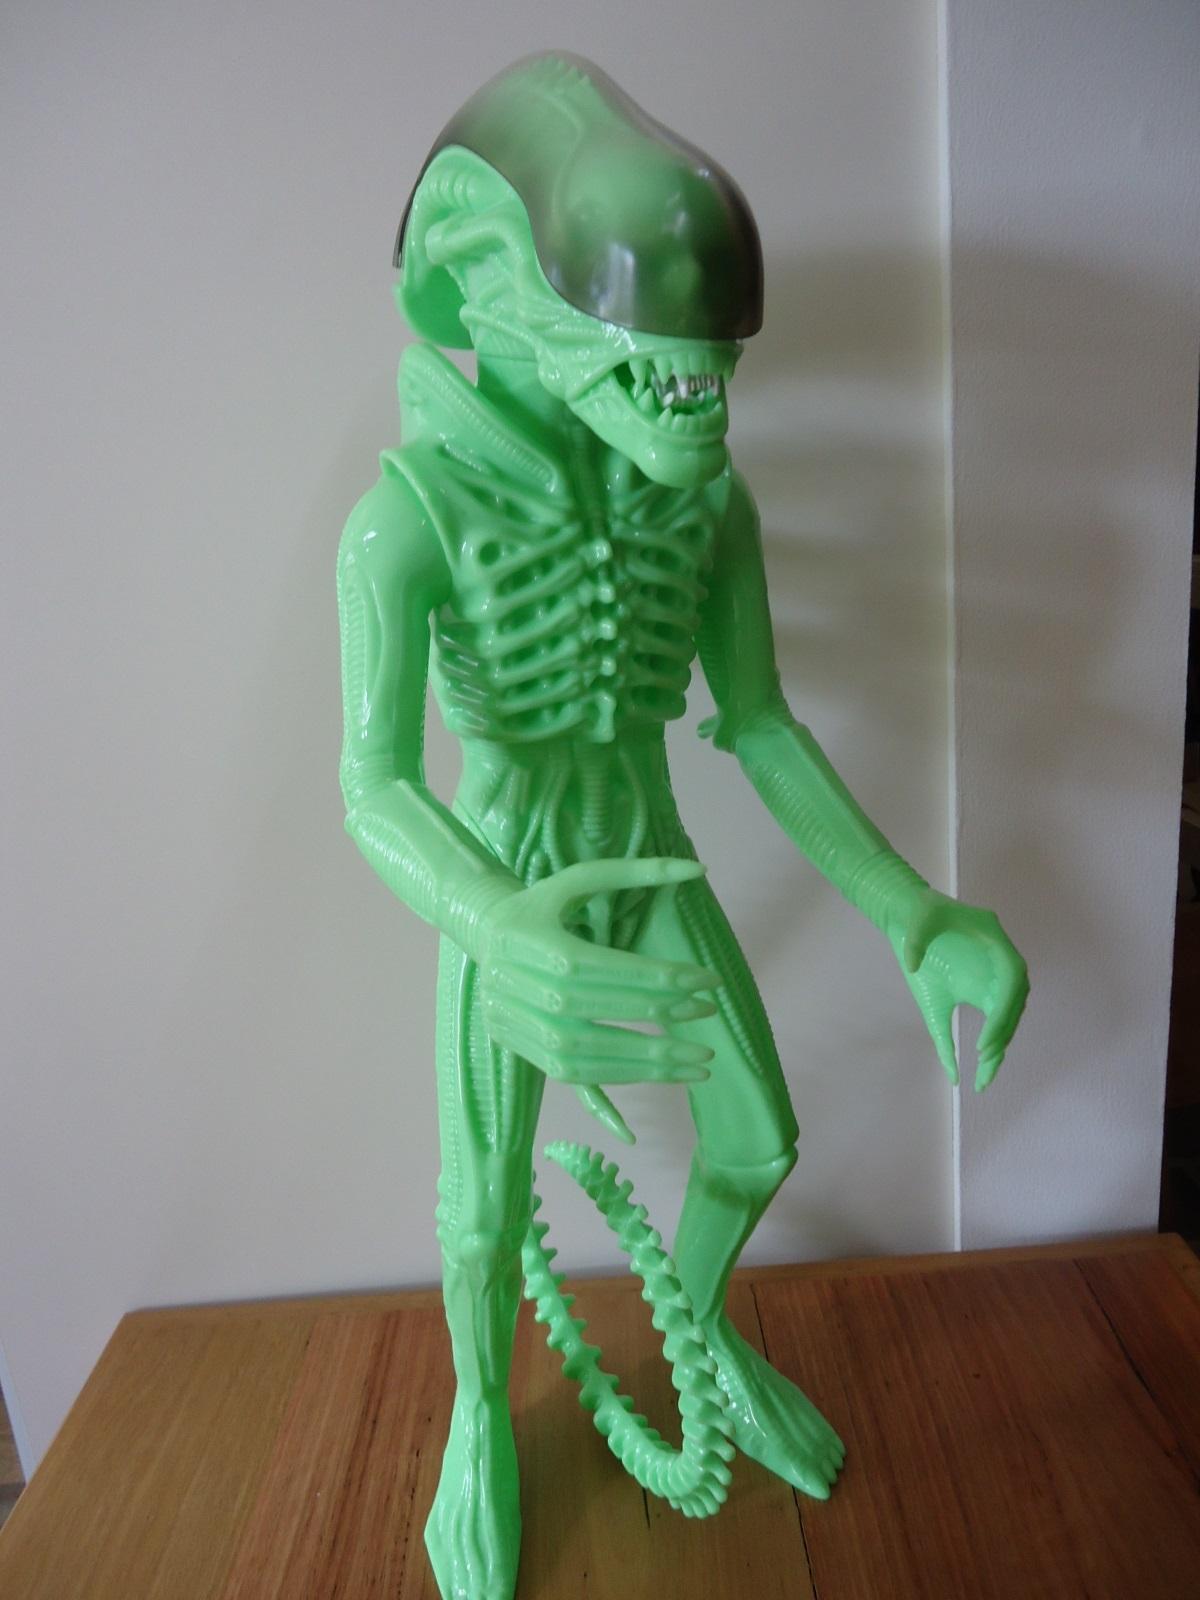 24 inch tall Gentle Giant glow in the dark ALIEN action figure.